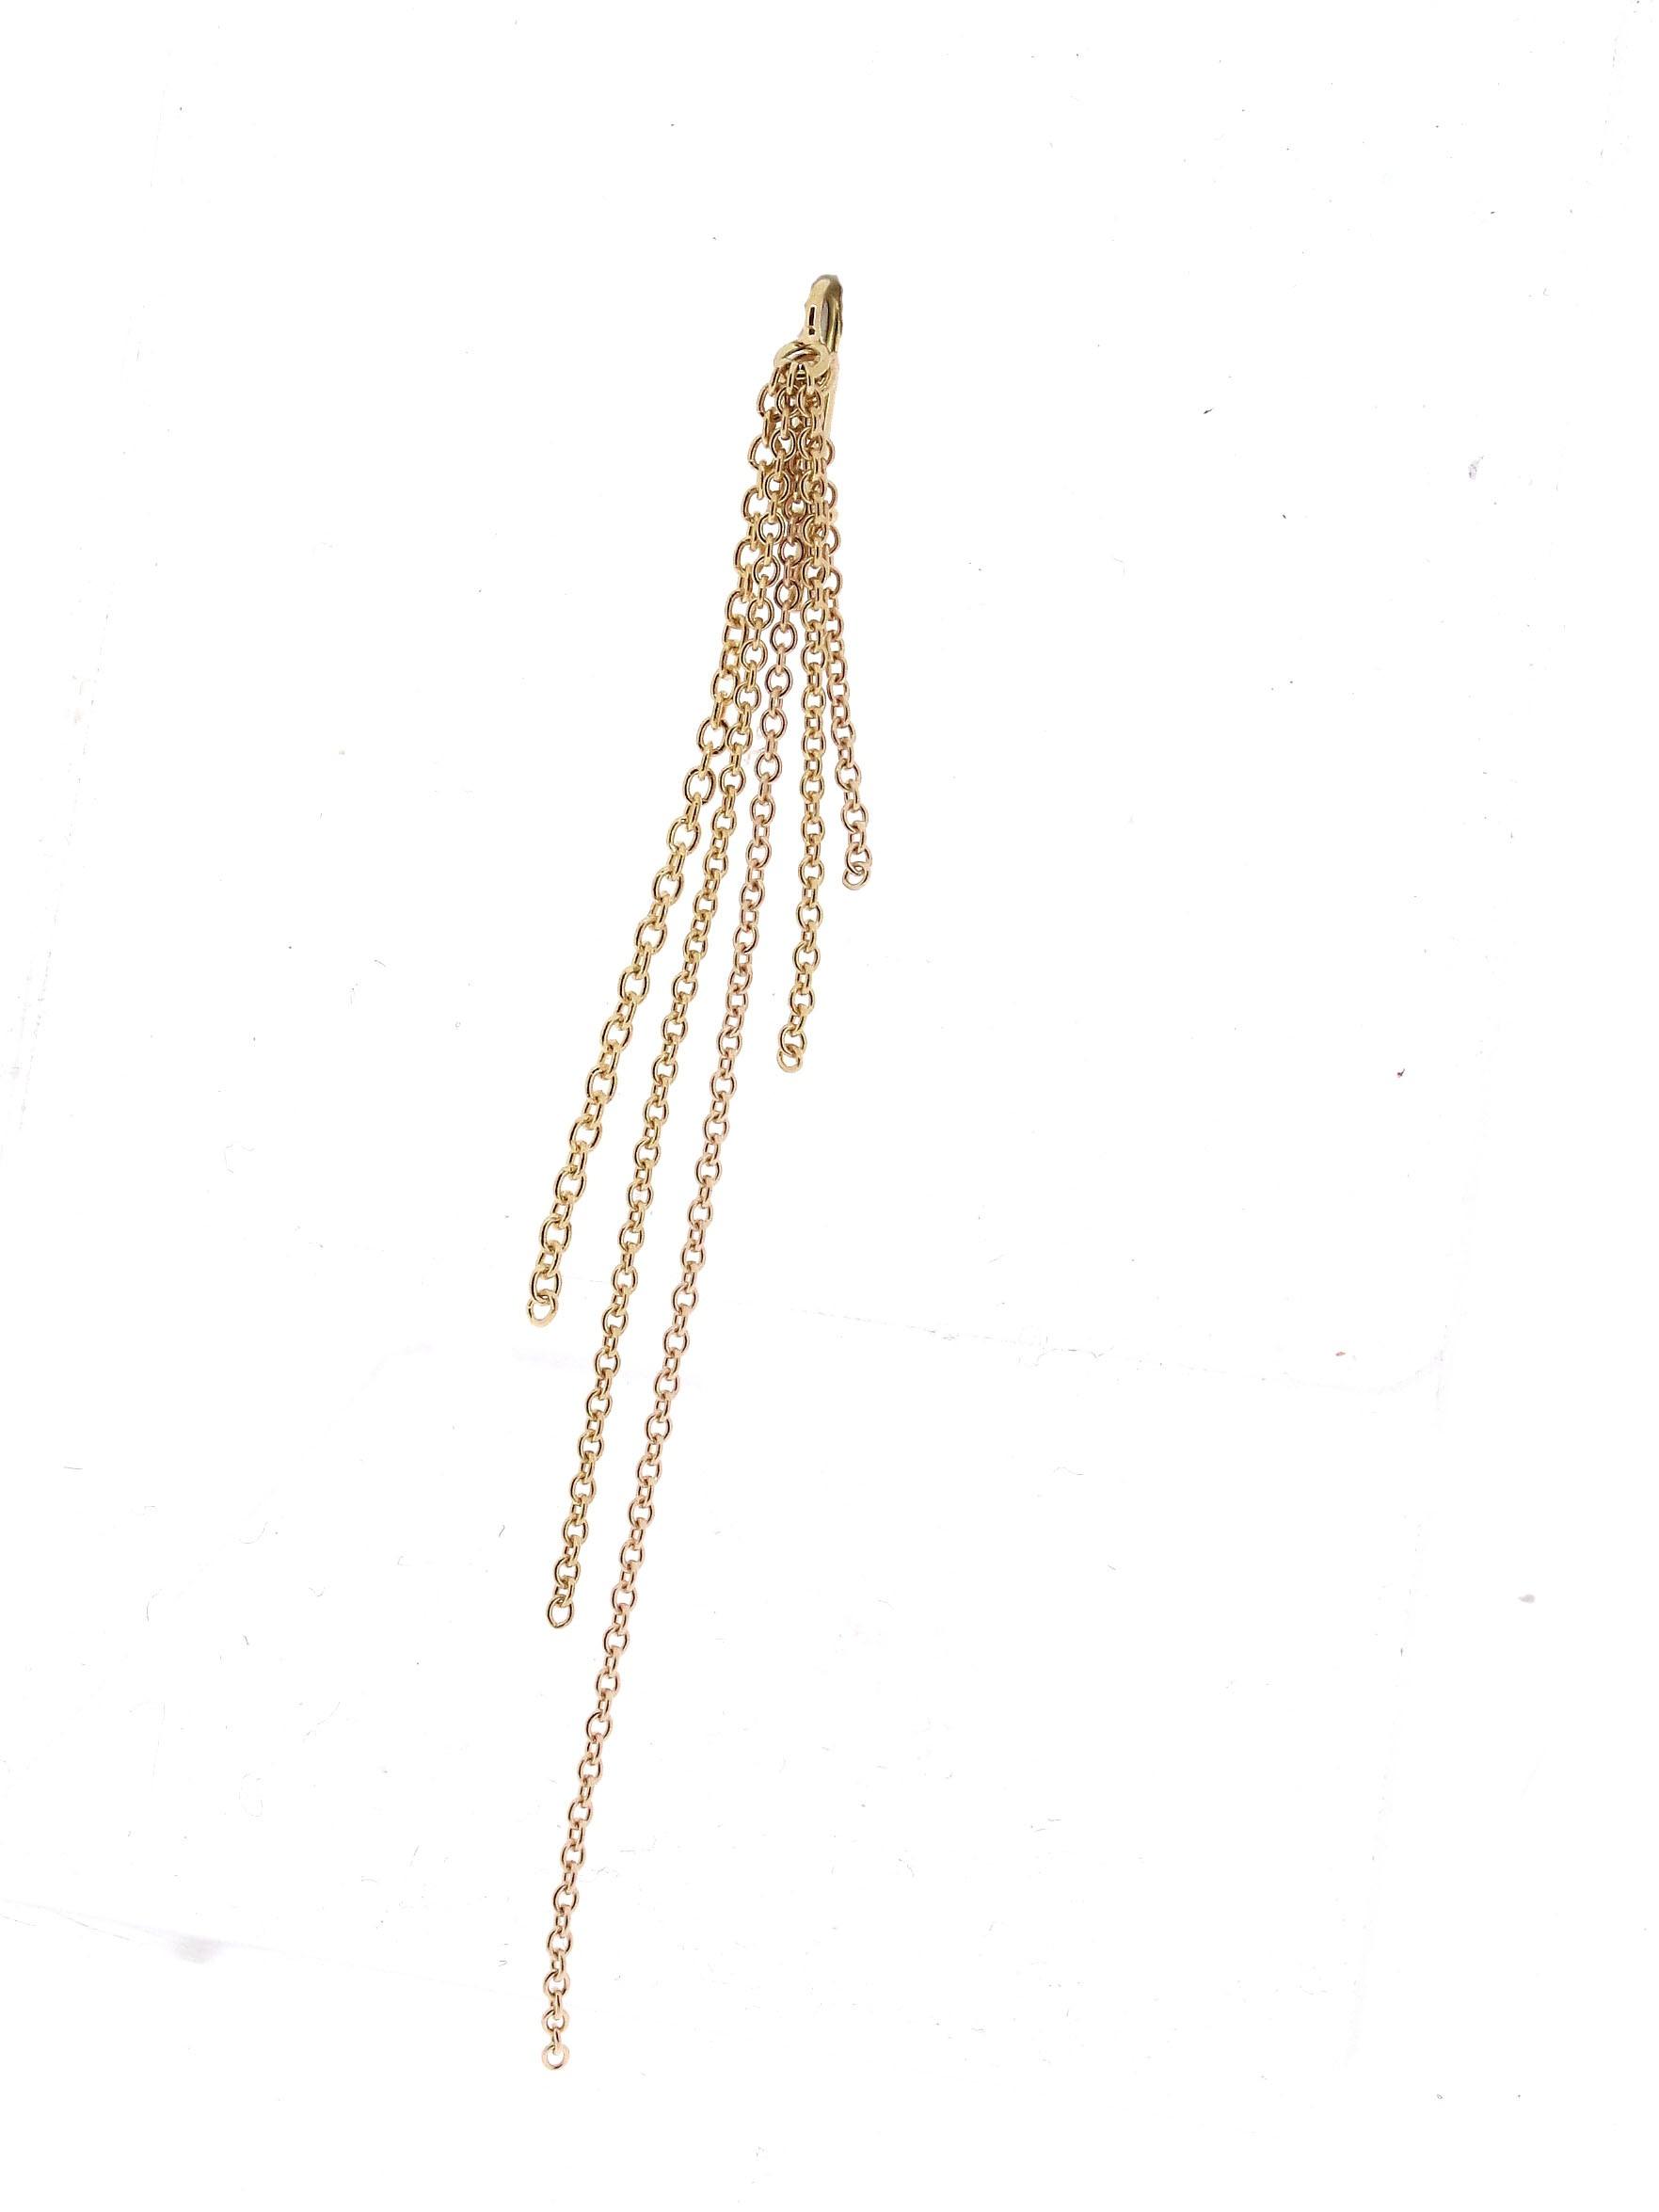 Ohrring Einhänger Kette 18ct - Ole Lynggaard - A2855-401